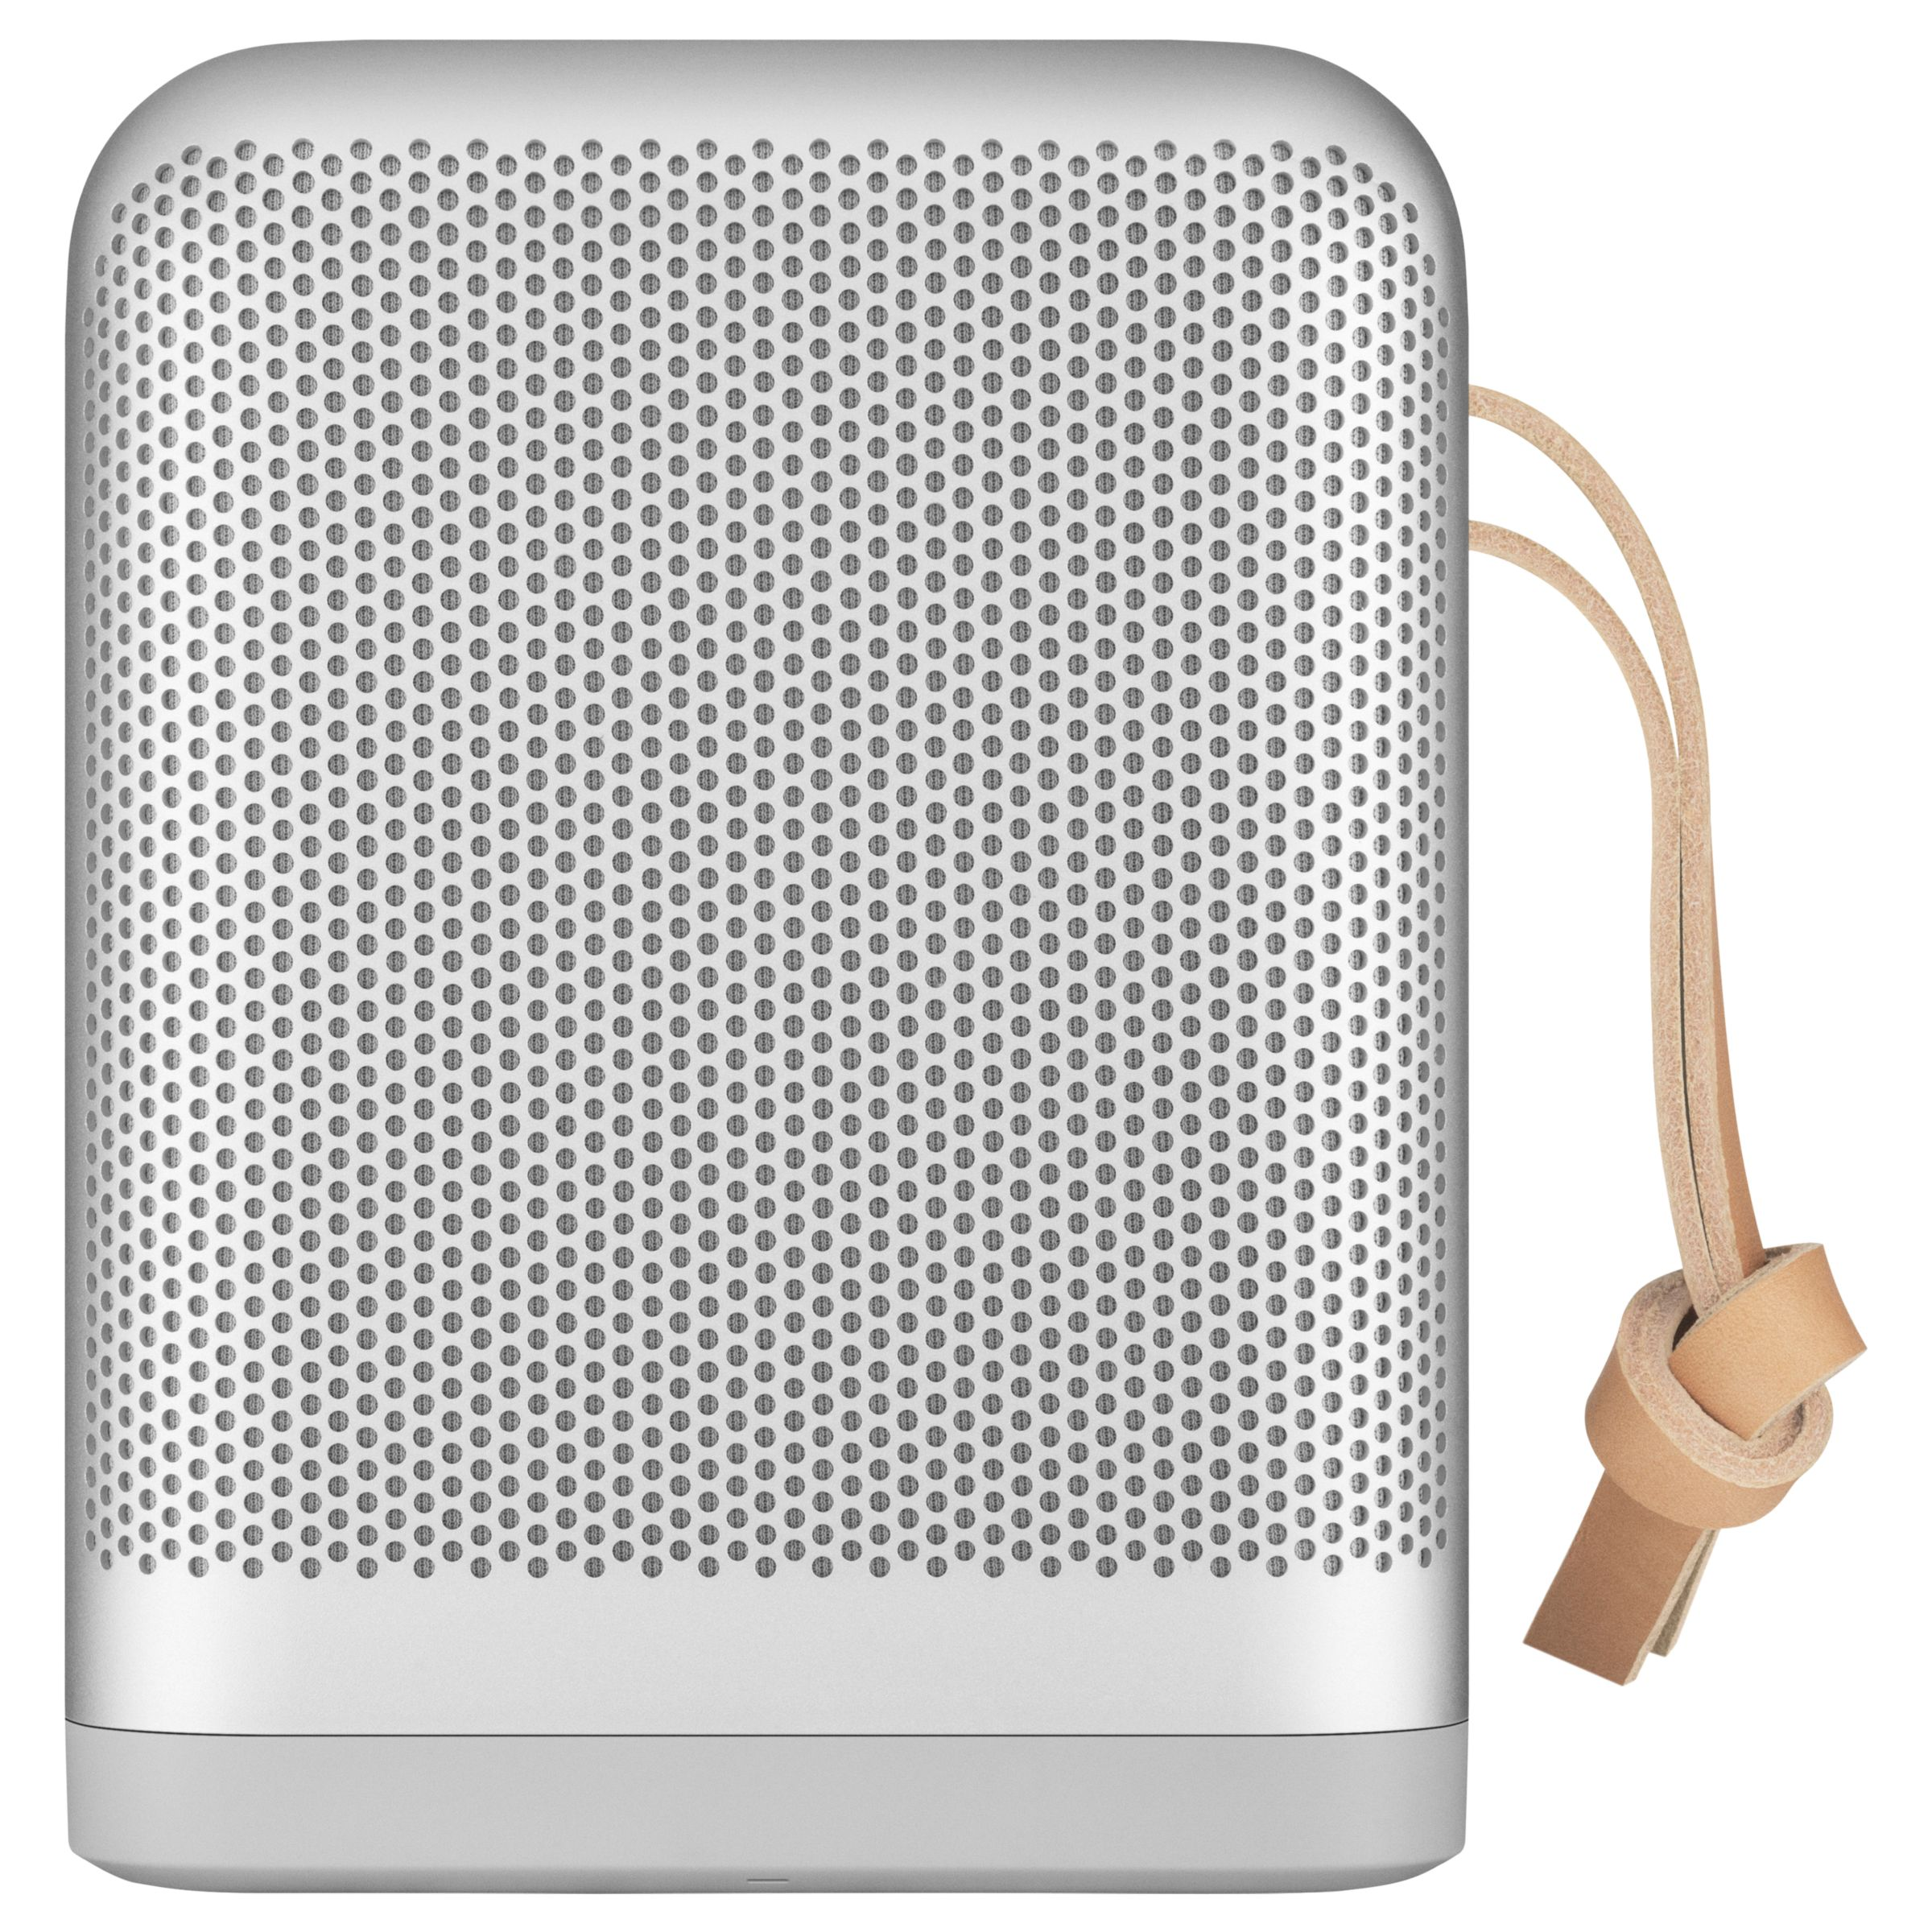 Bang & Olufsen Bang & Olufsen Beoplay P6 Portable Splash-Resistant Bluetooth Speaker